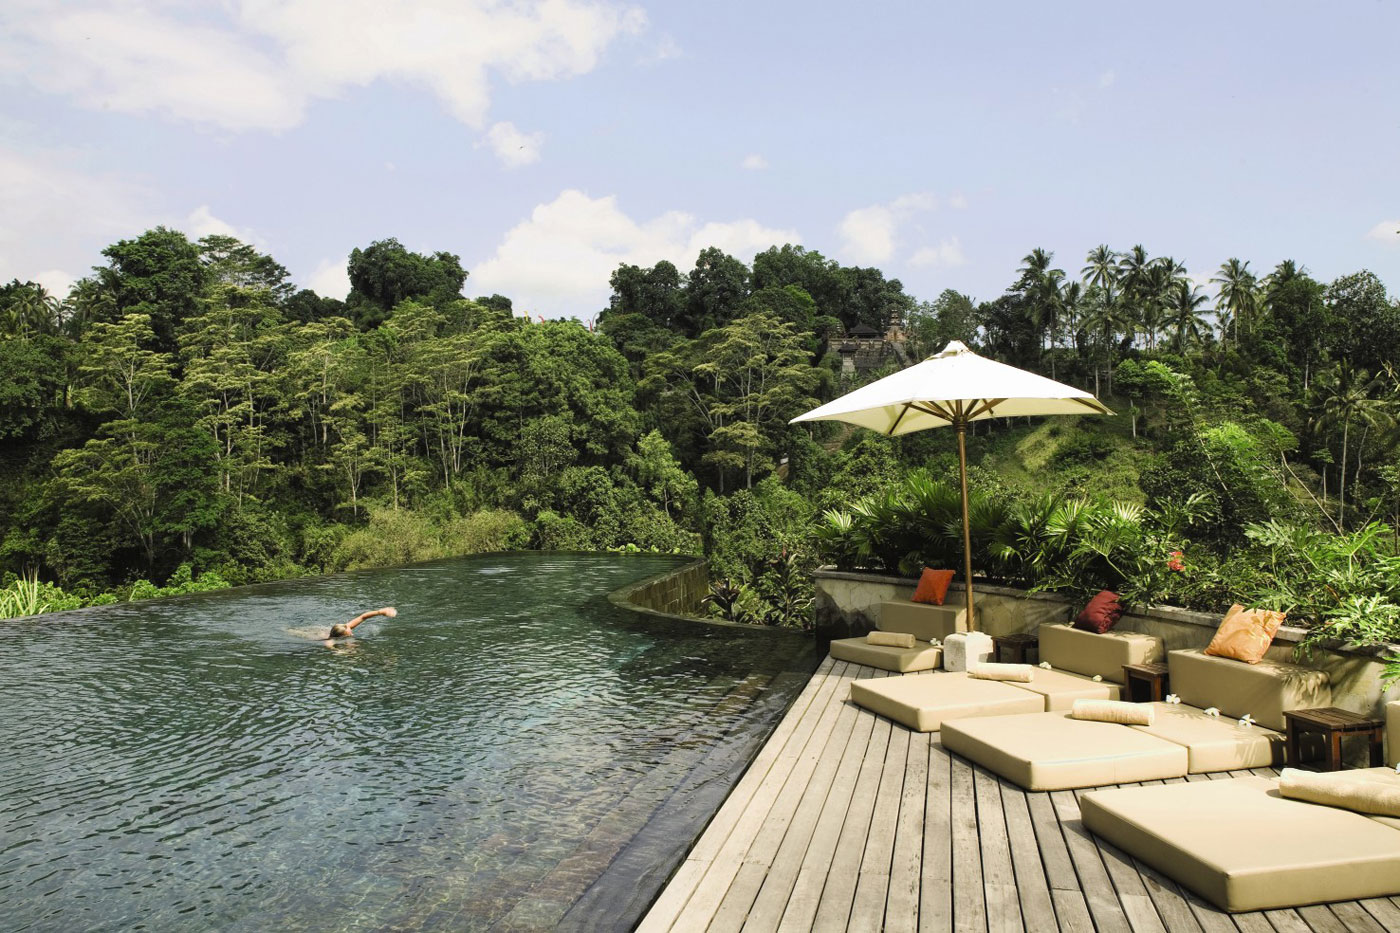 Hanging Infinity Pools in Bali at Ubud Hotel & Resort